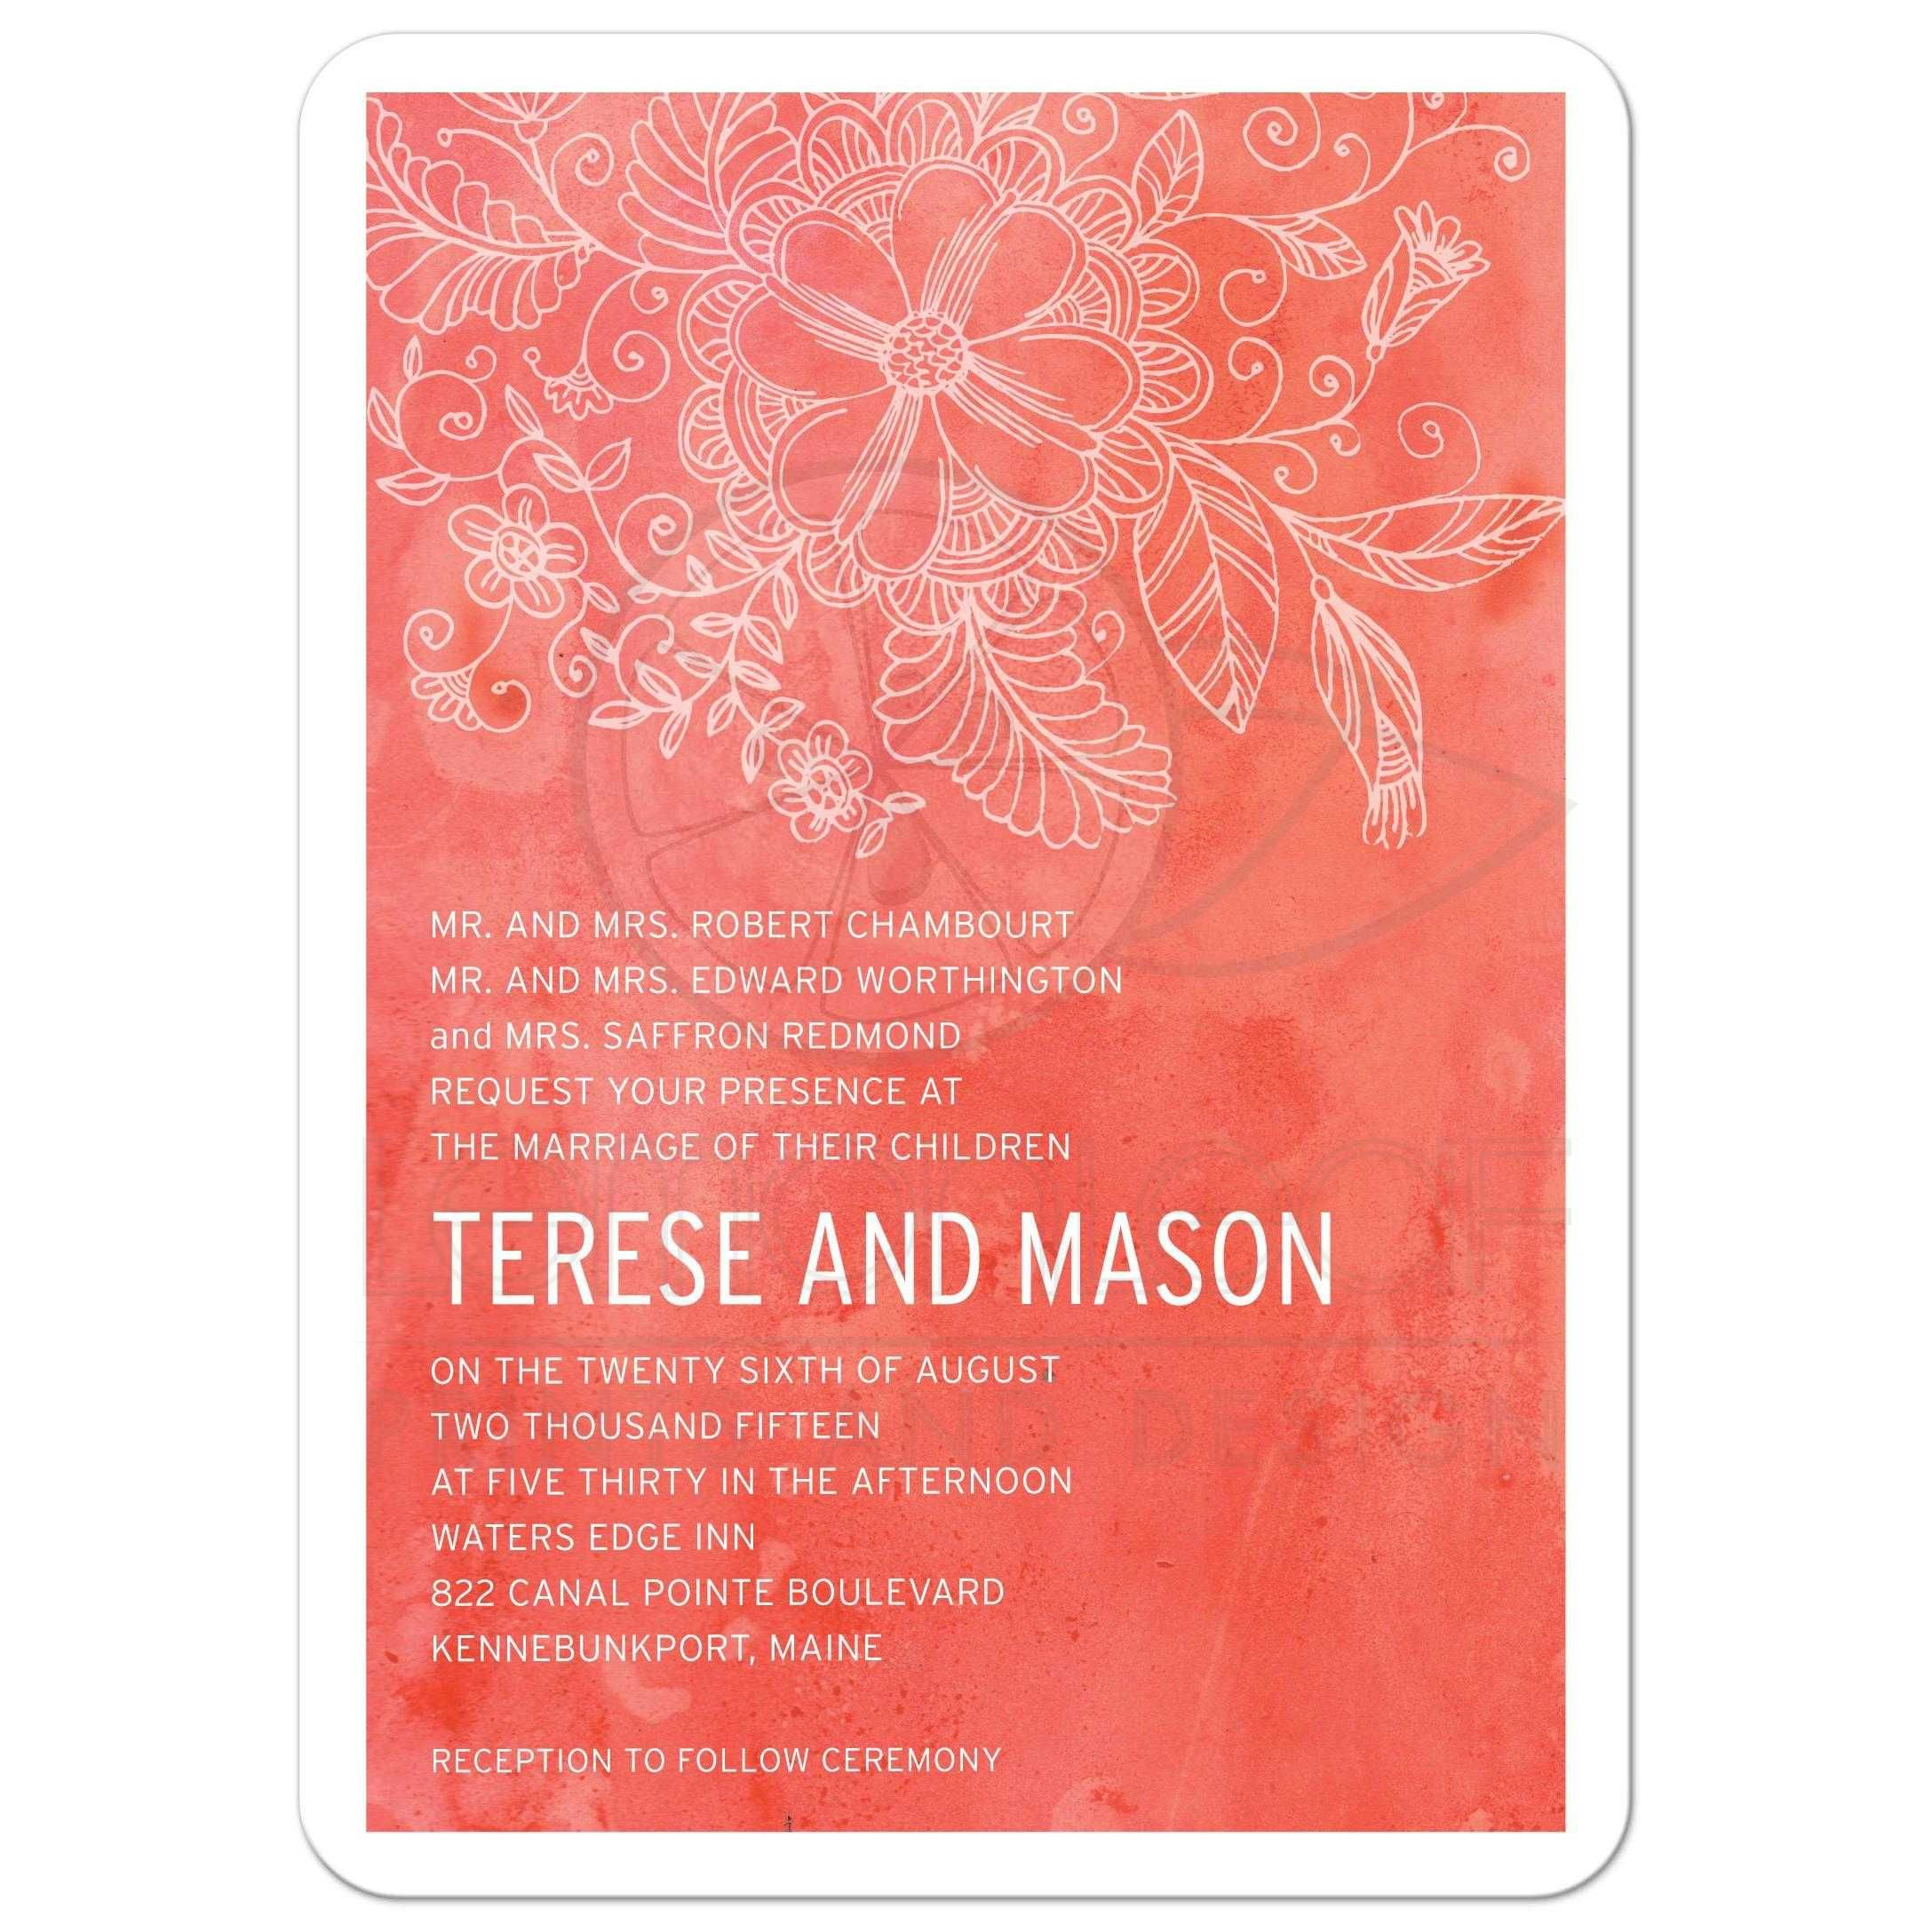 Wedding invitation - Outlined Floral Orange Watercolor | Outlines ...